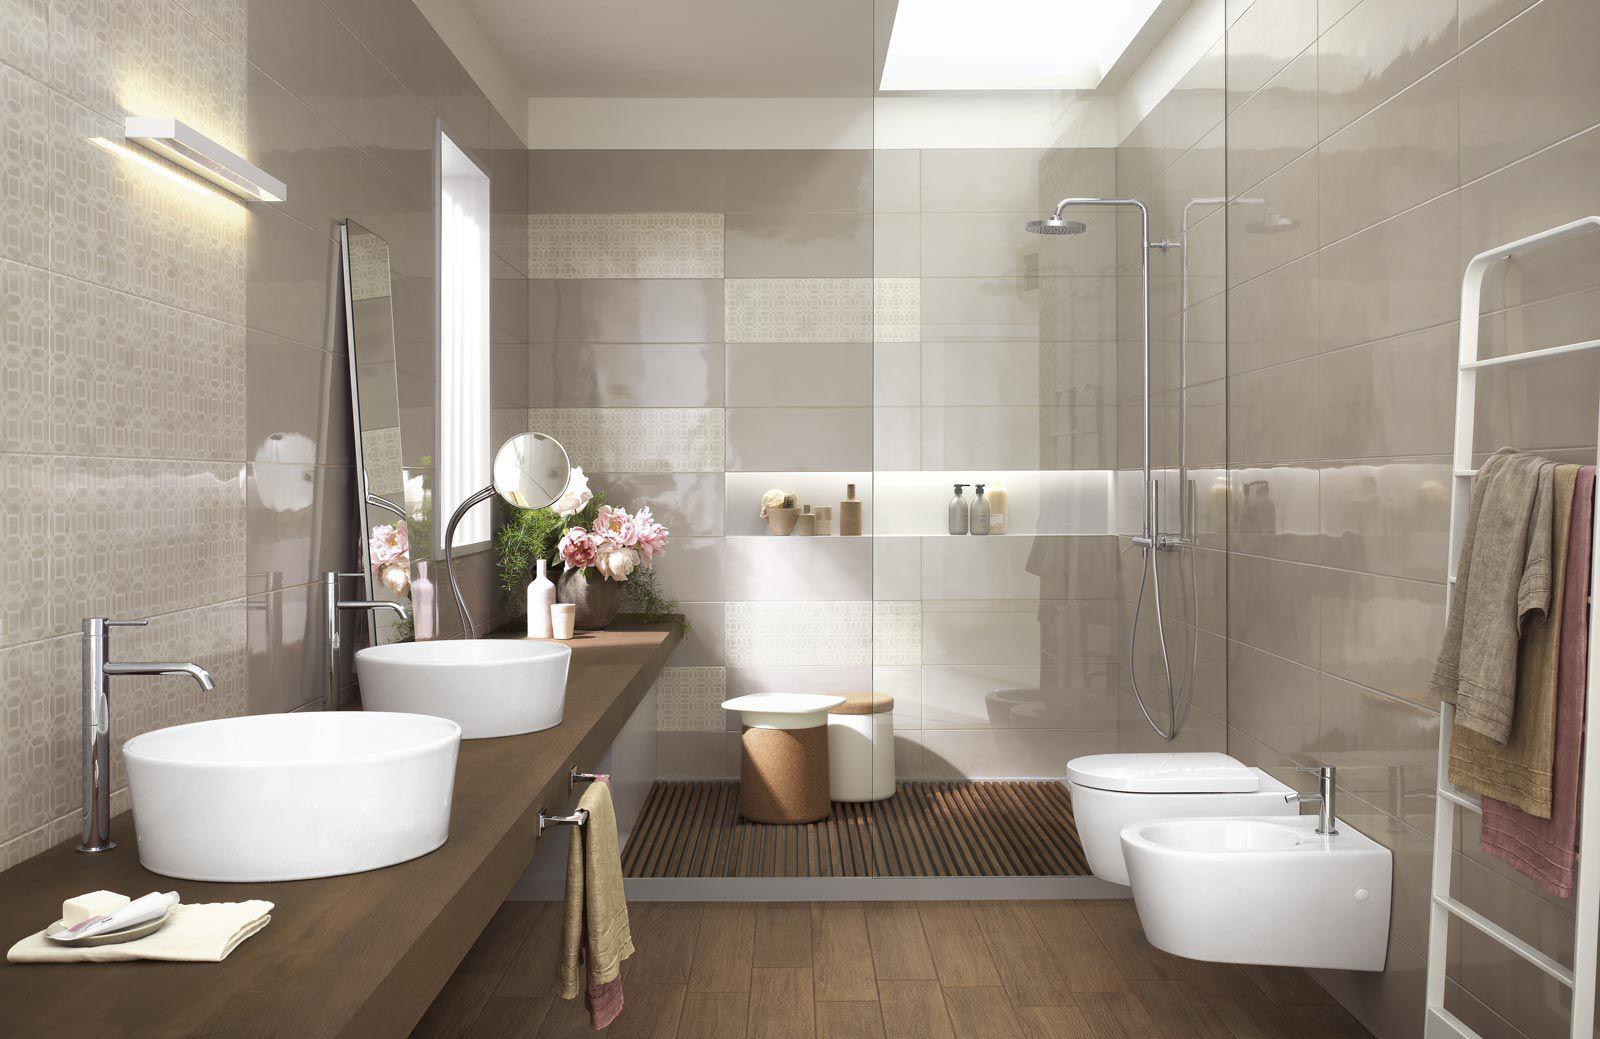 Bathroom tile / wall / ceramic / high-gloss - HANDMADE - Ragno - Videos